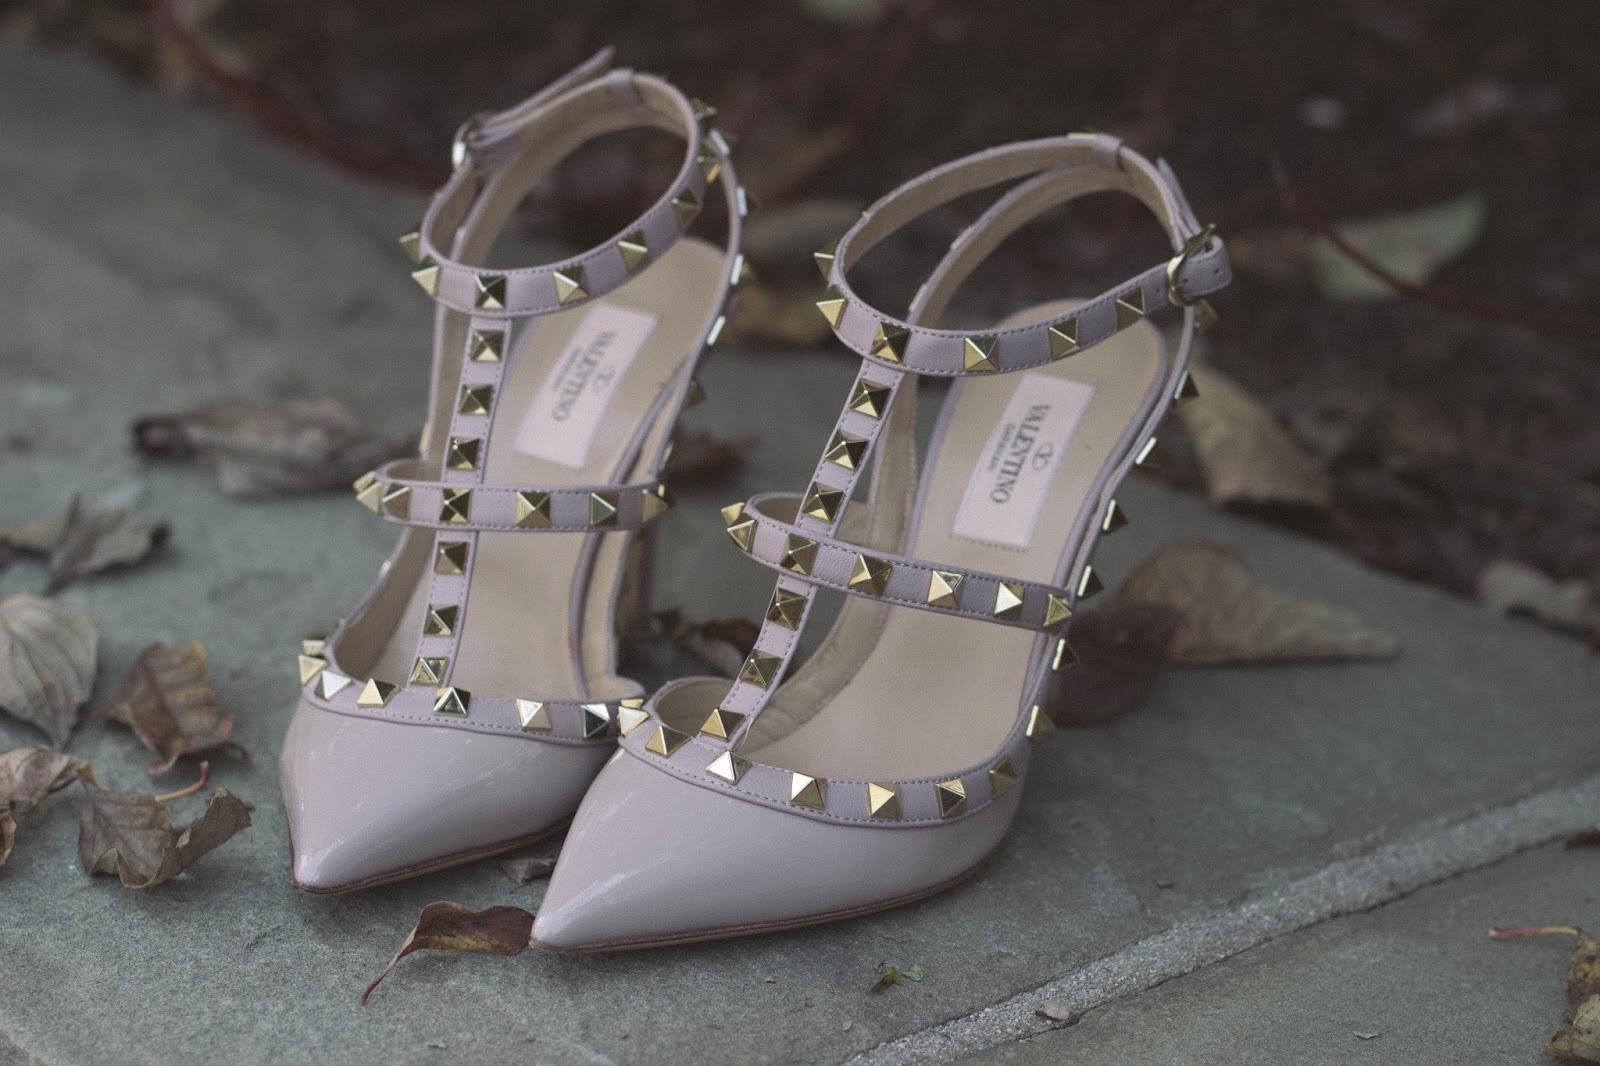 valentino rockstud heels, melba nguyen, soletrekking, tory burch bags